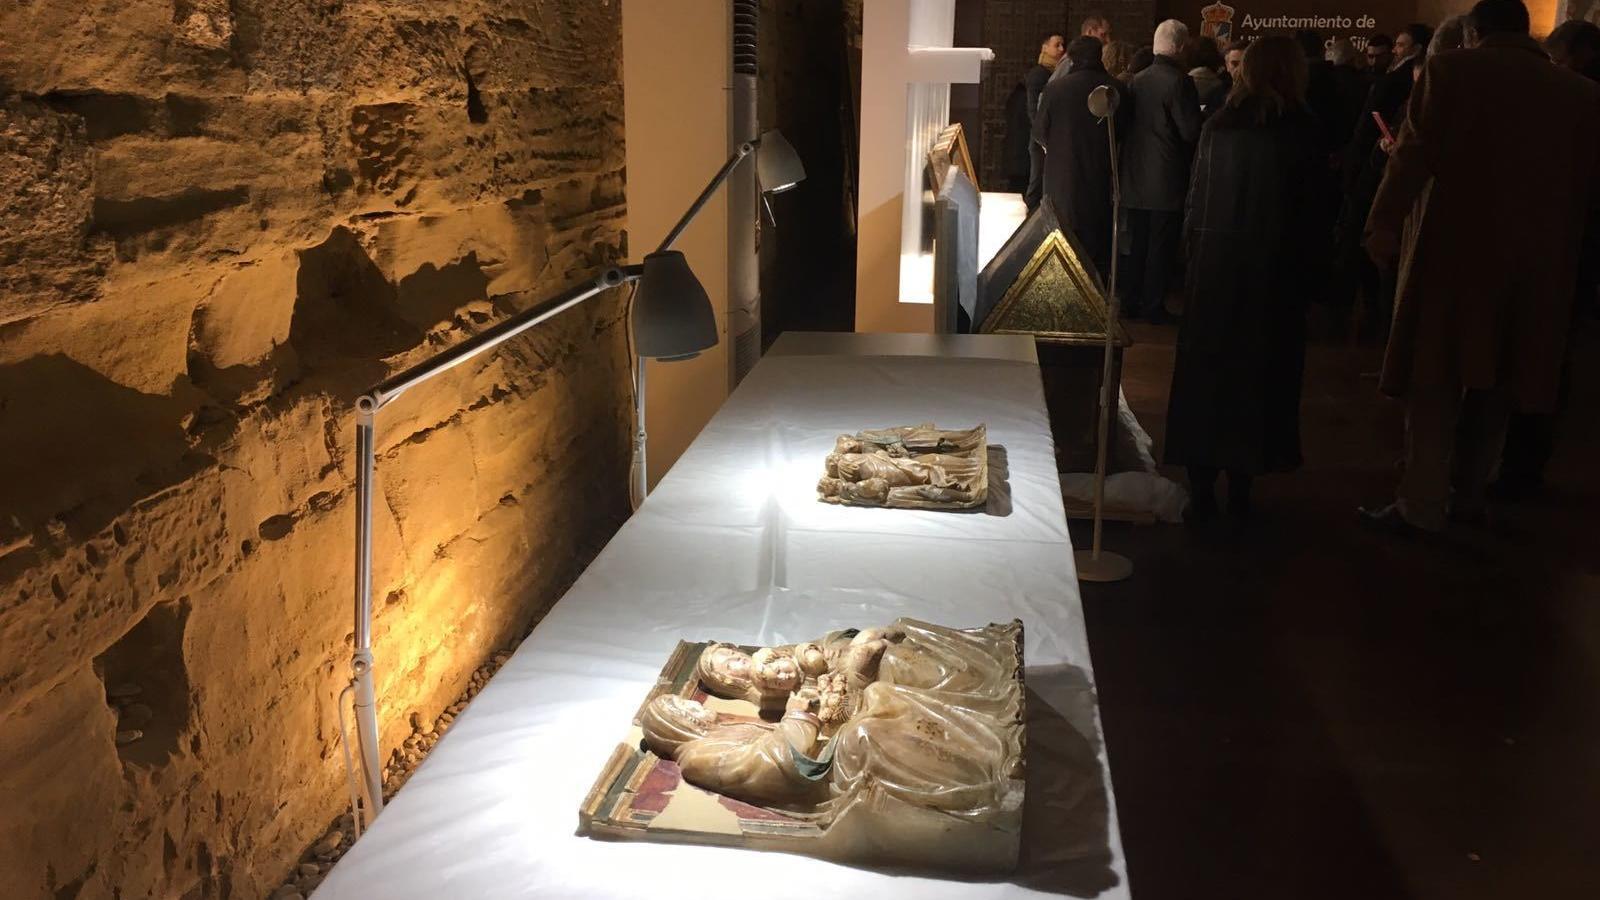 Dos fragments del retaule d'alabastre de Gabriel Joly al monestir de Sixena